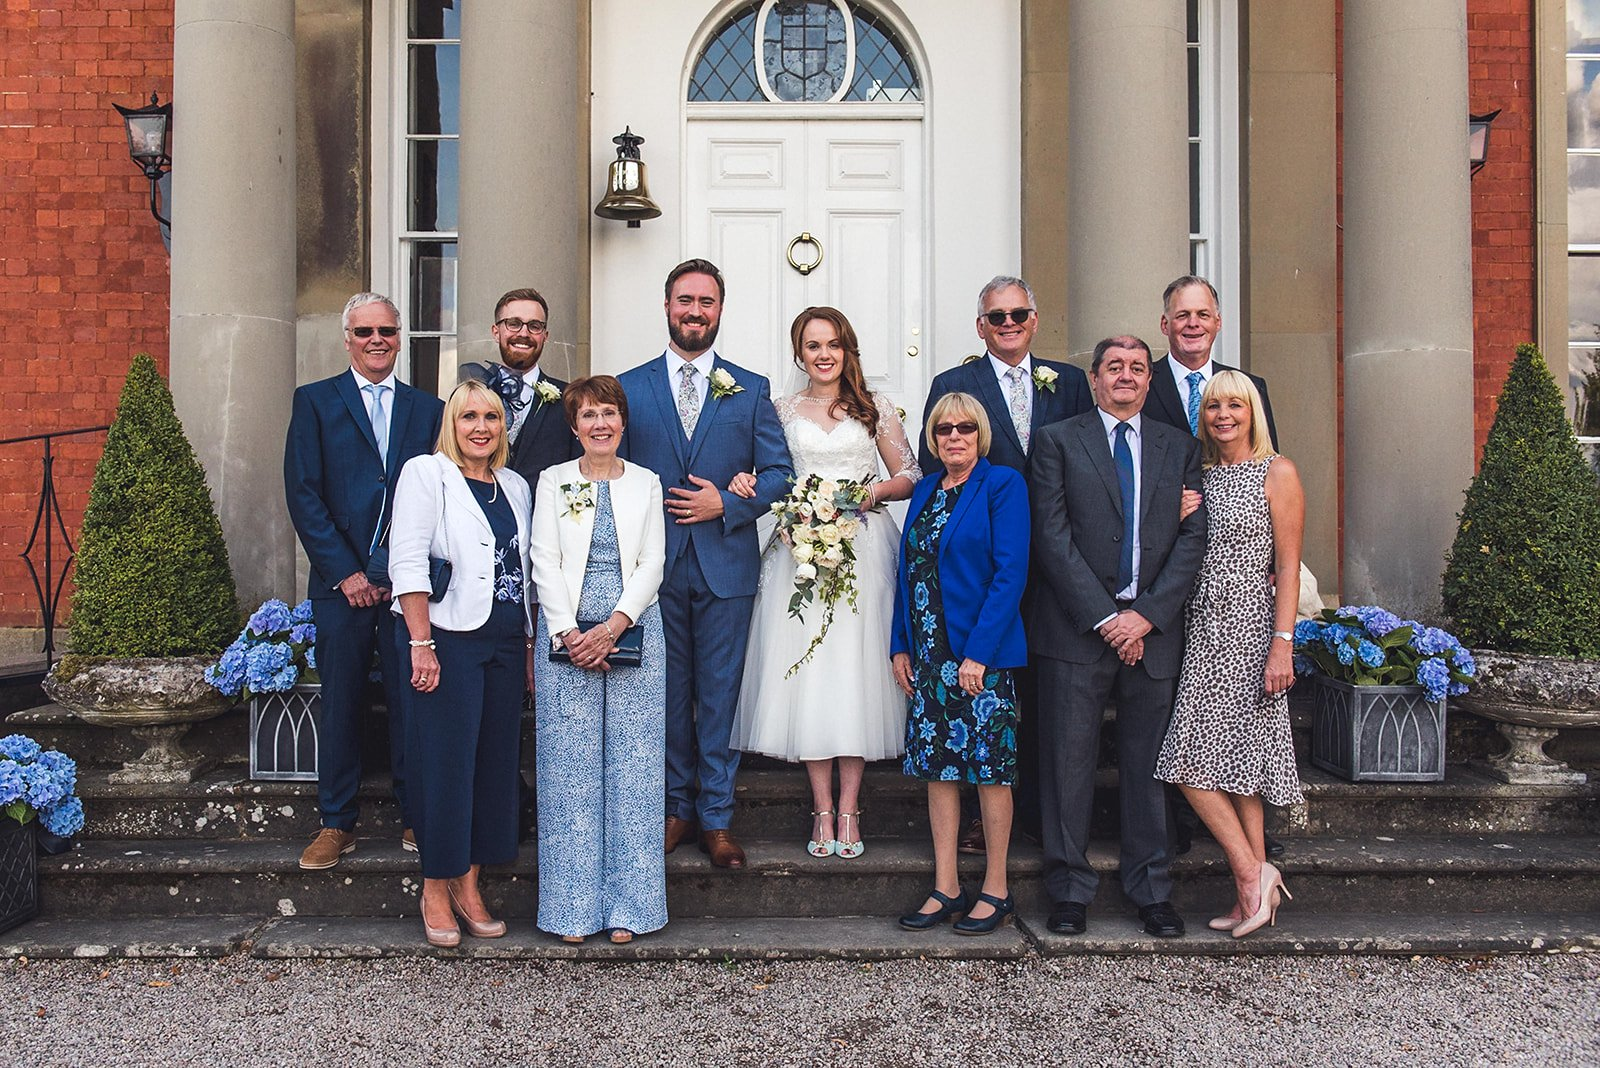 Large family group wedding photography group shots